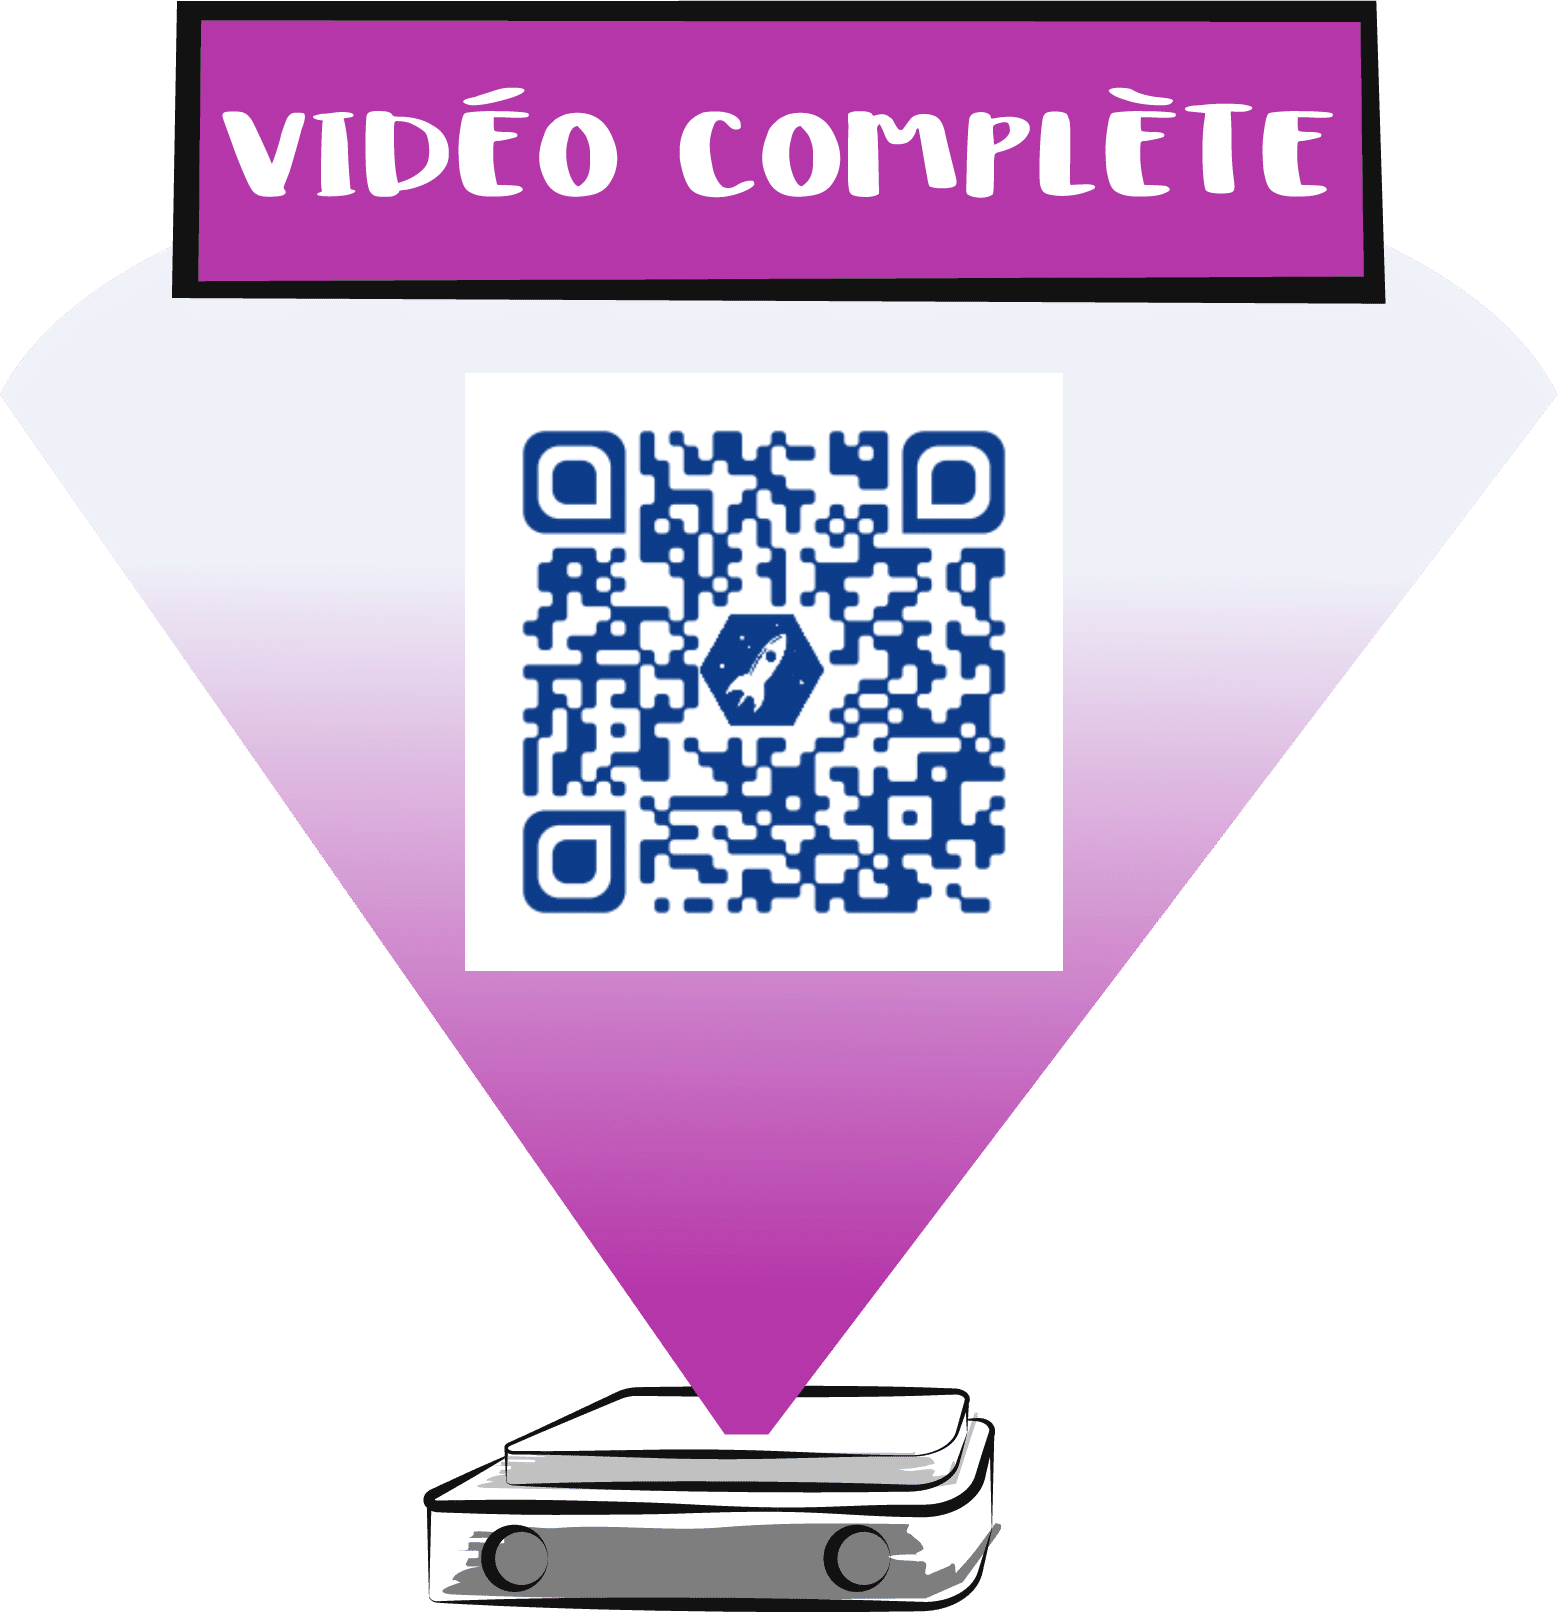 qr code video complete roche